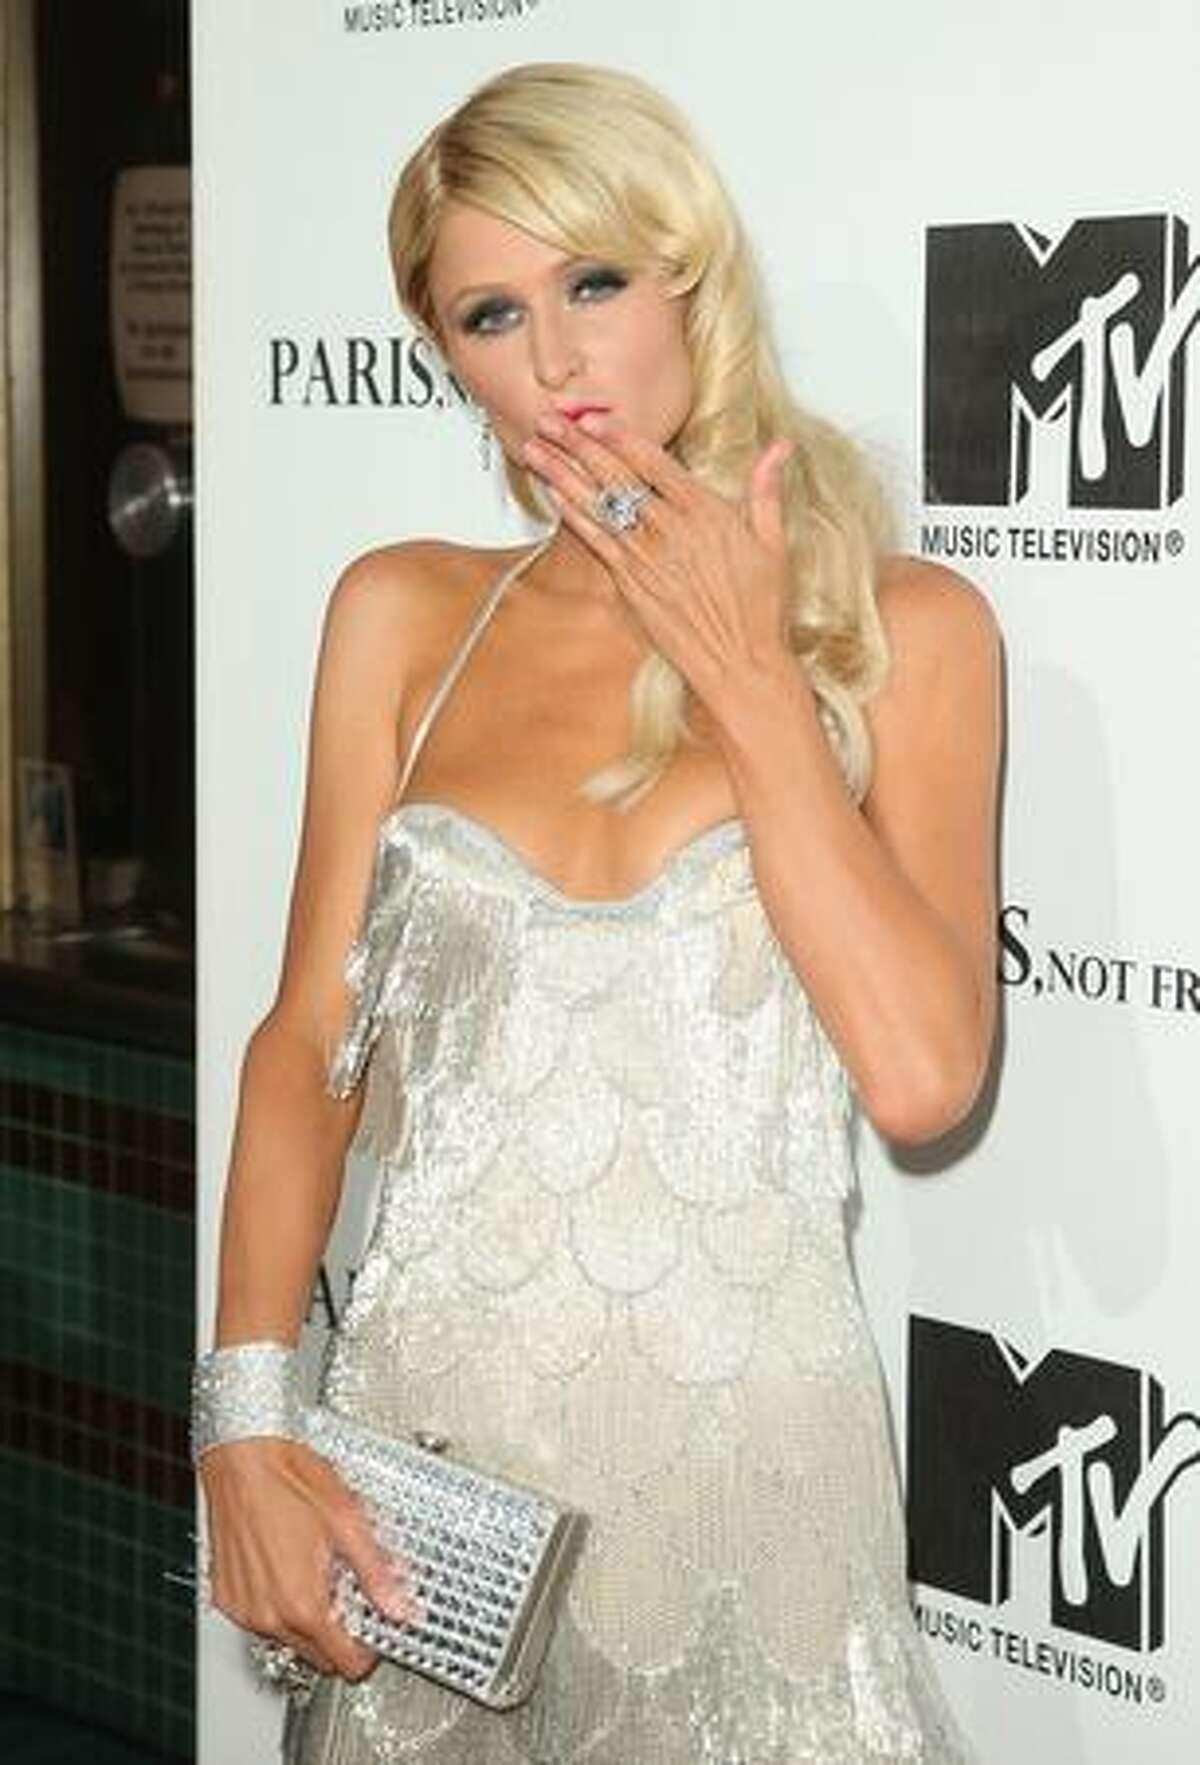 Socialite Paris Hilton arrives at the MTV screening of